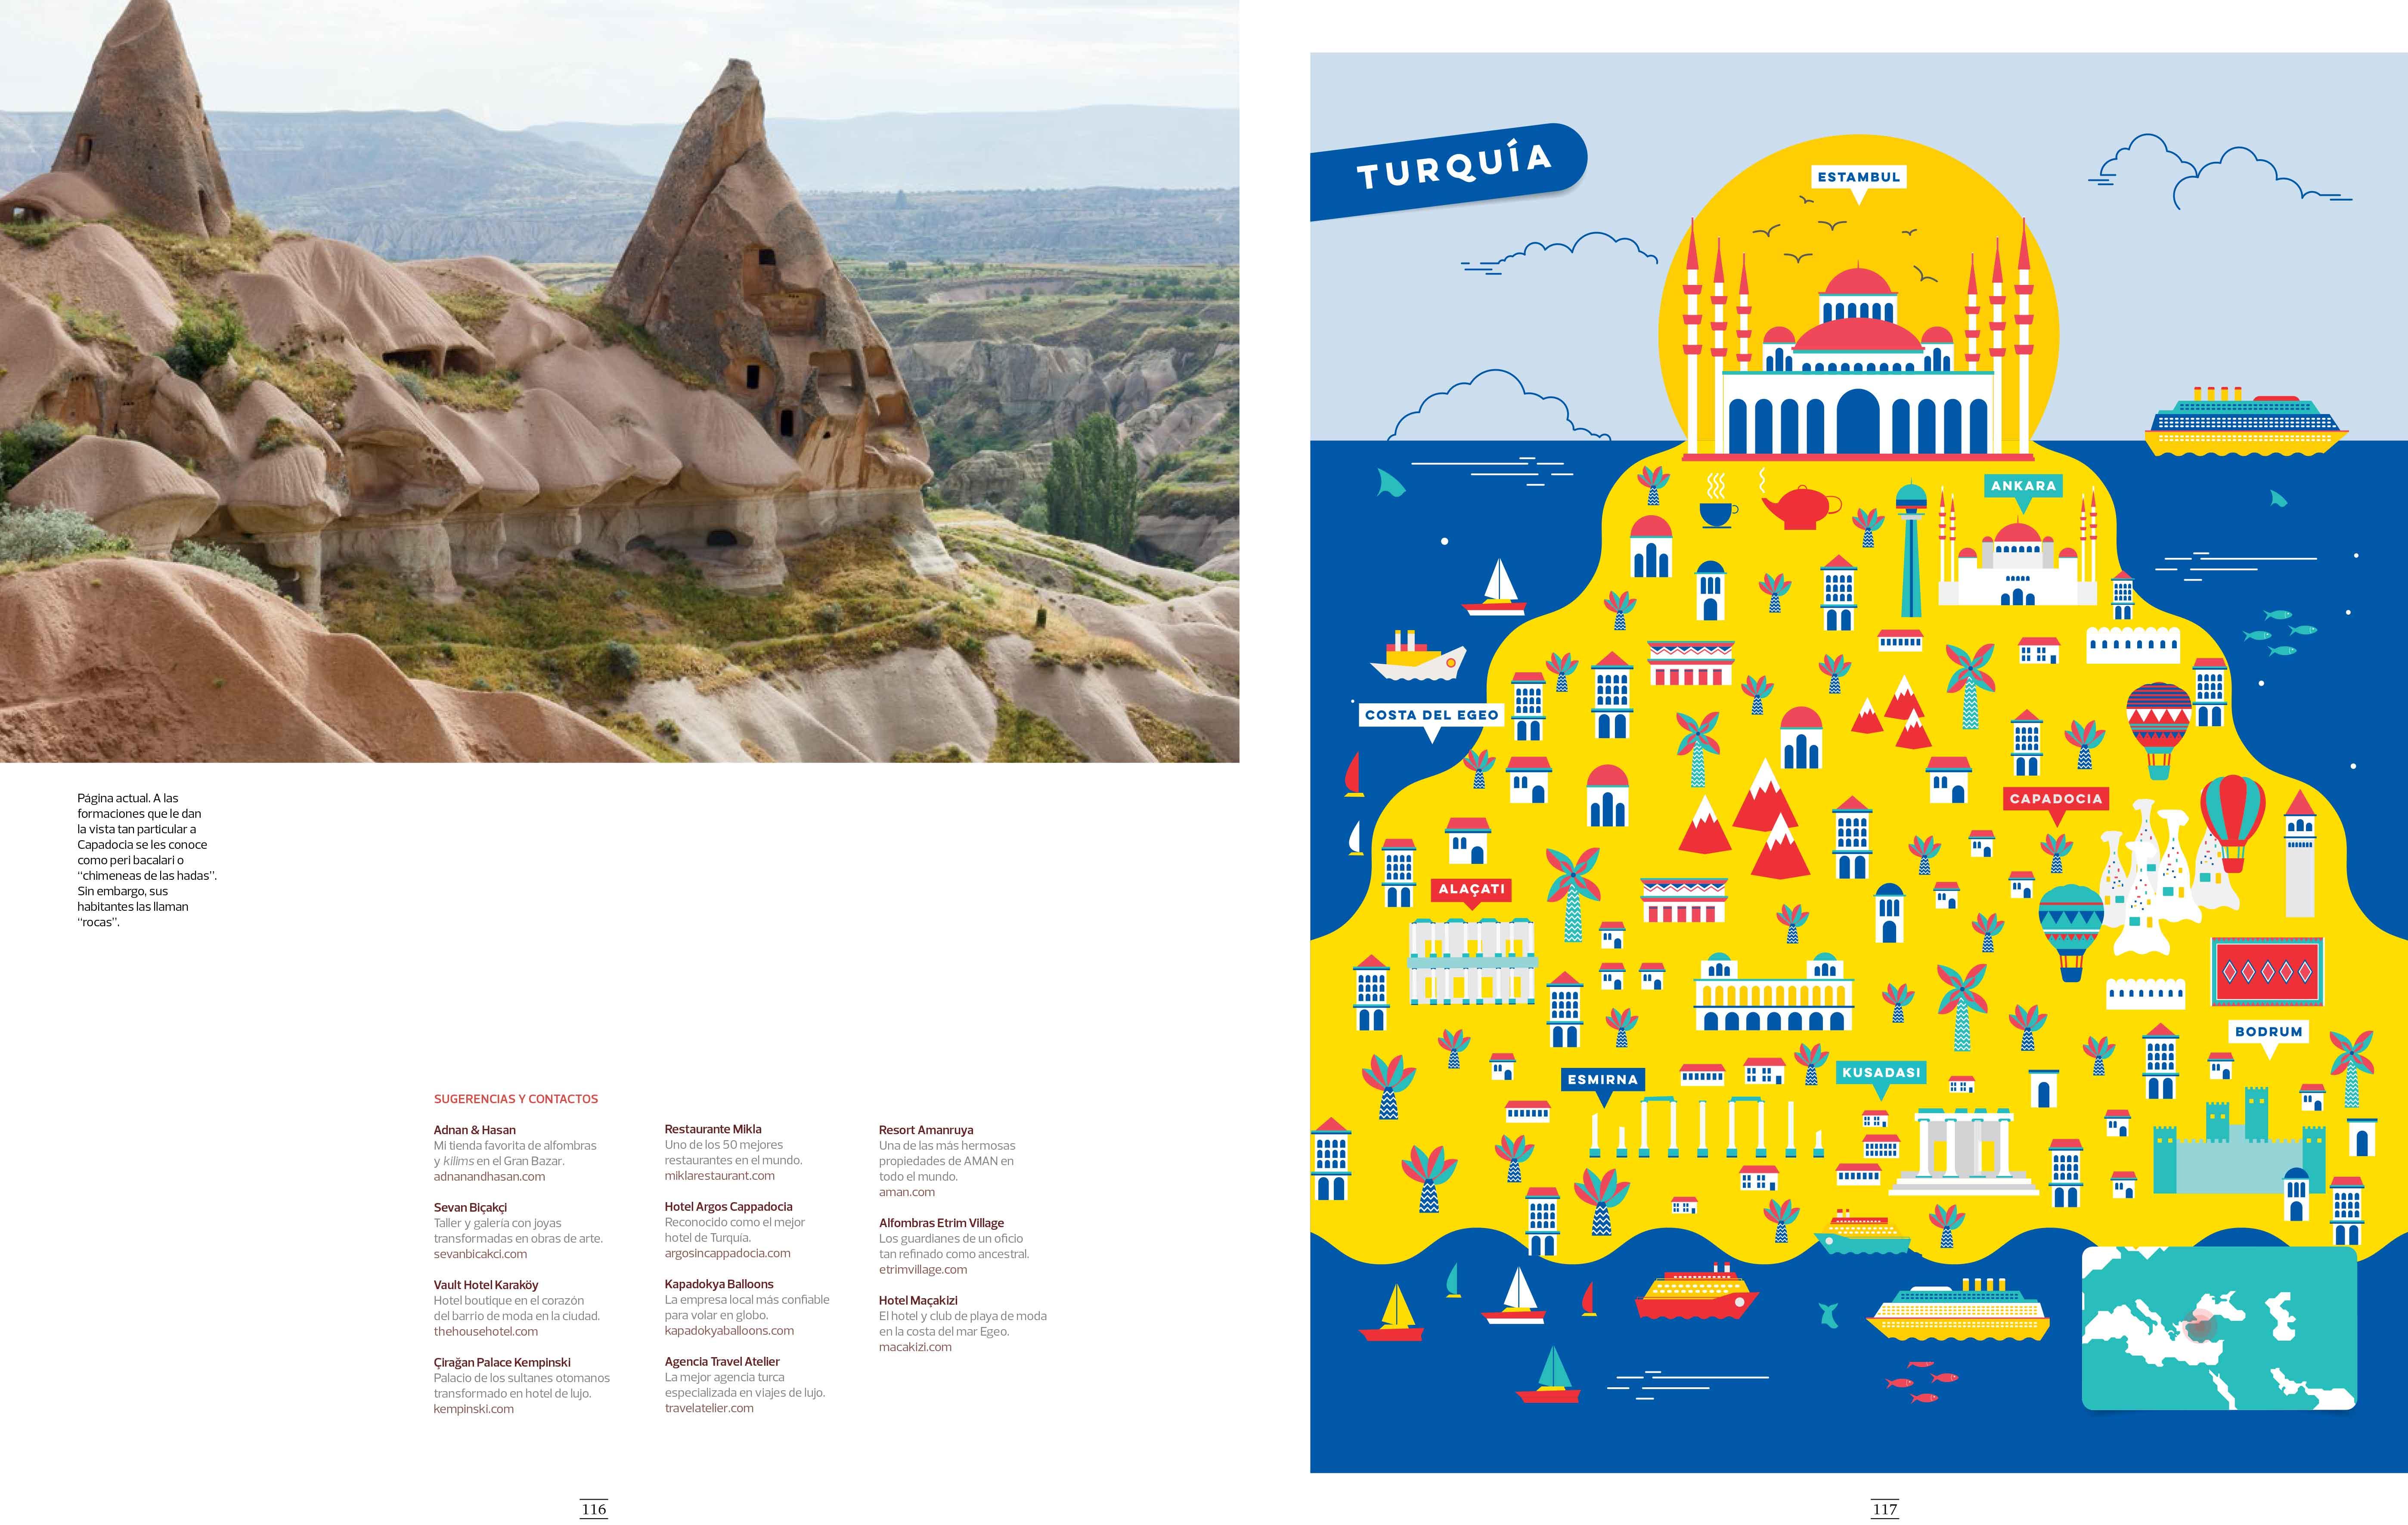 Luxury Travel Magazine Turquia